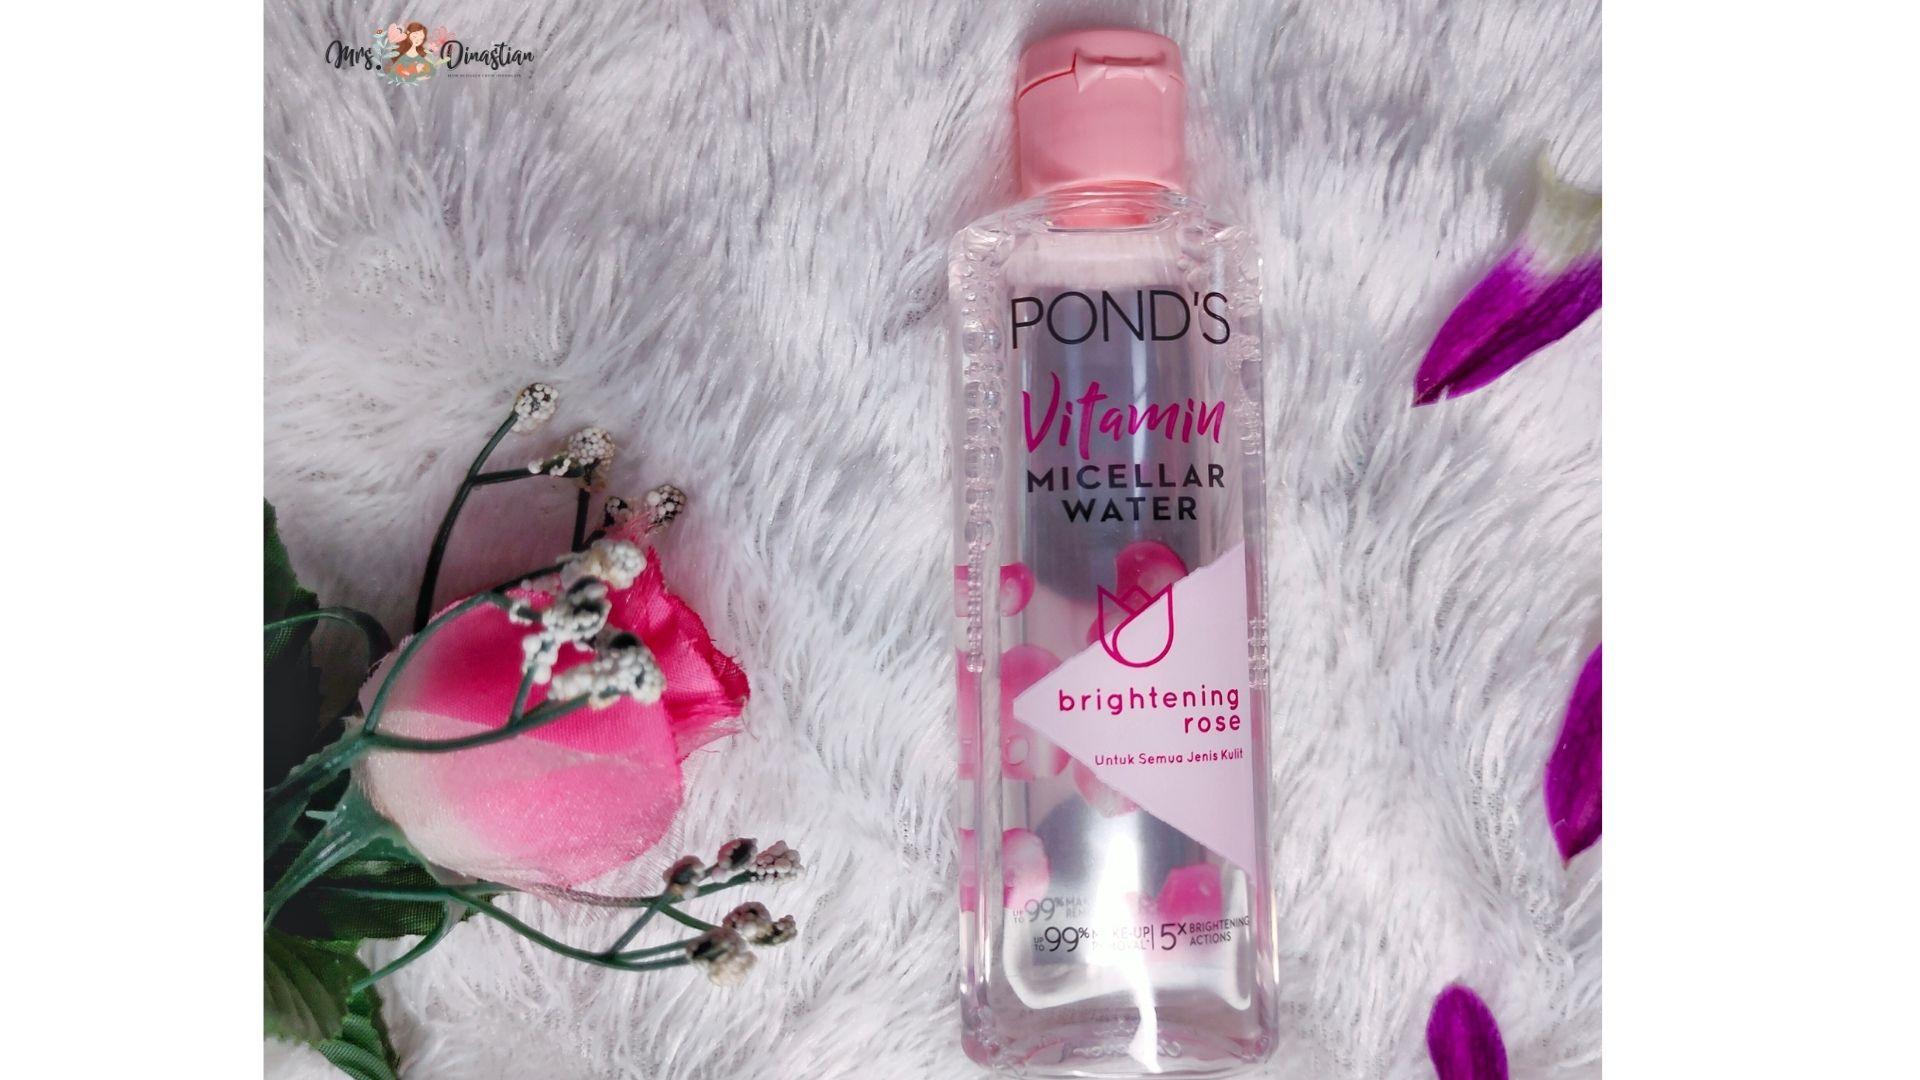 Ponds Vitamin Micellar Water Brightening Rose